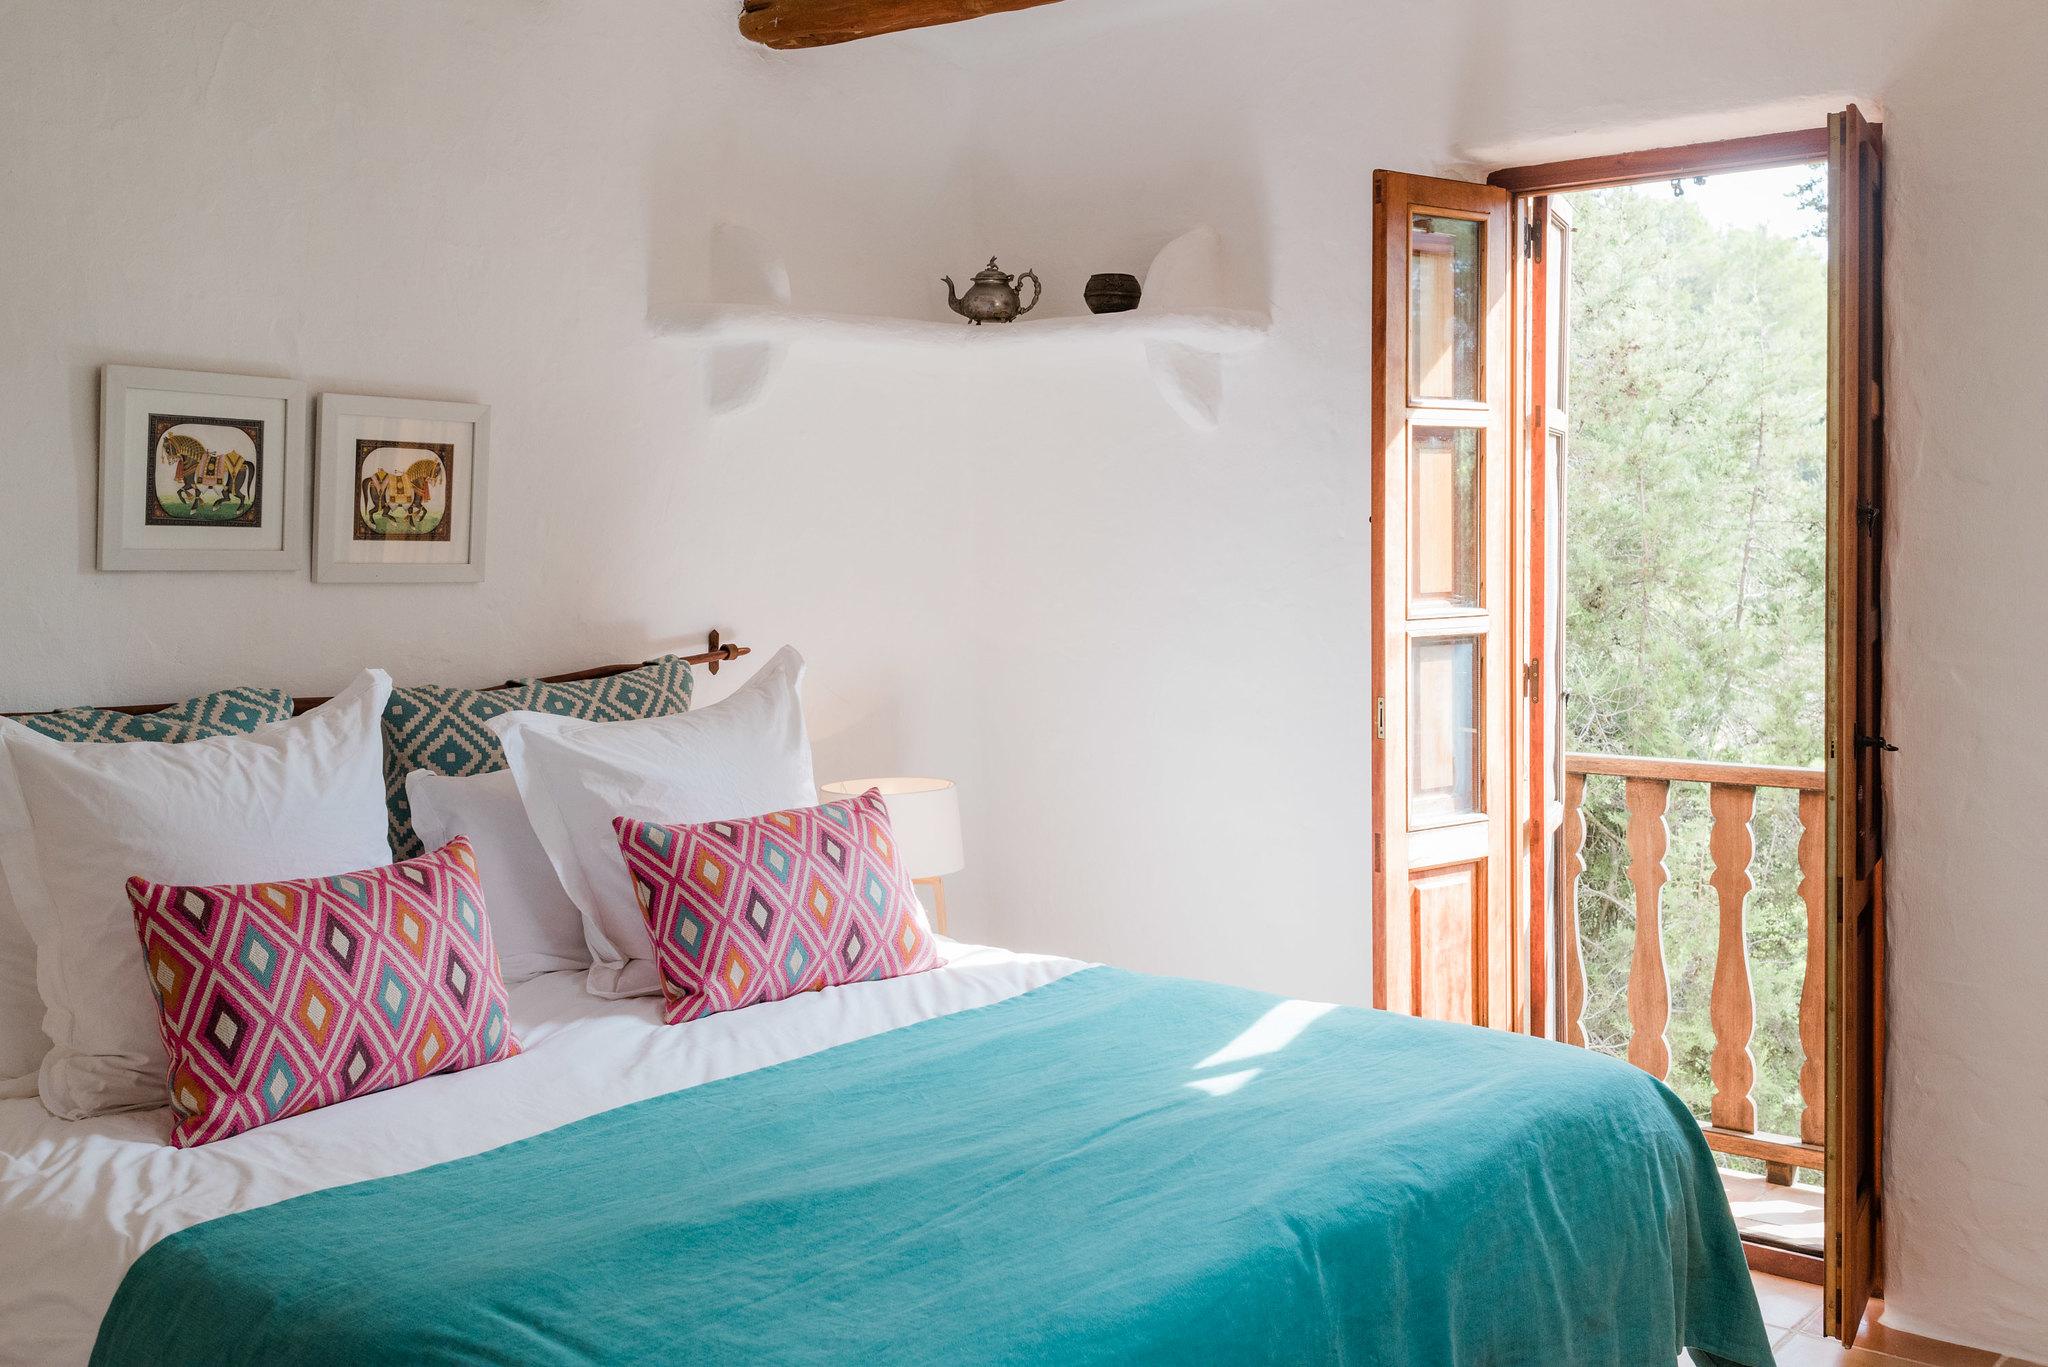 https://www.white-ibiza.com/wp-content/uploads/2020/05/white-ibiza-villas-can-sabina-interior-bedroom6.jpg